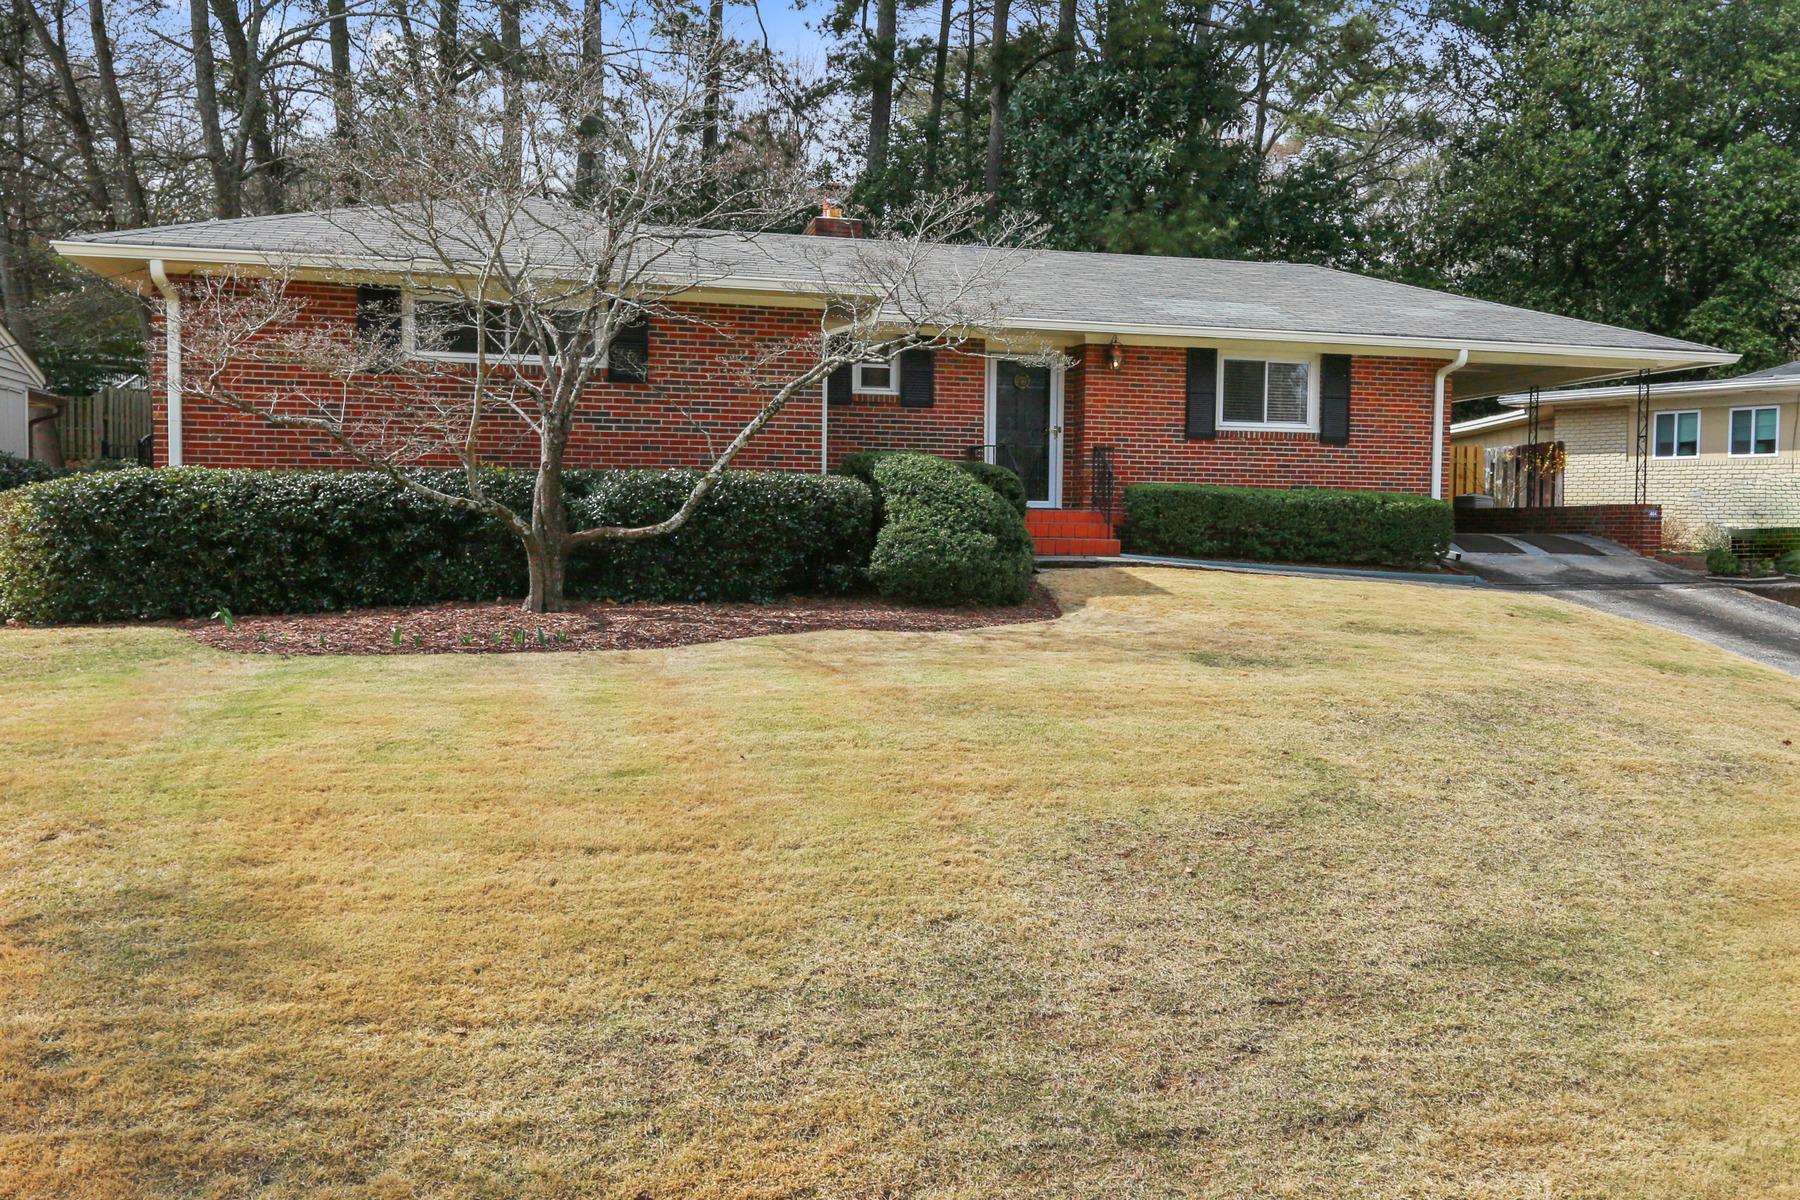 Single Family Home for Sale at Renovated Garden Hills 404 Springdale Drive NE Garden Hills, Atlanta, Georgia, 30305 United States